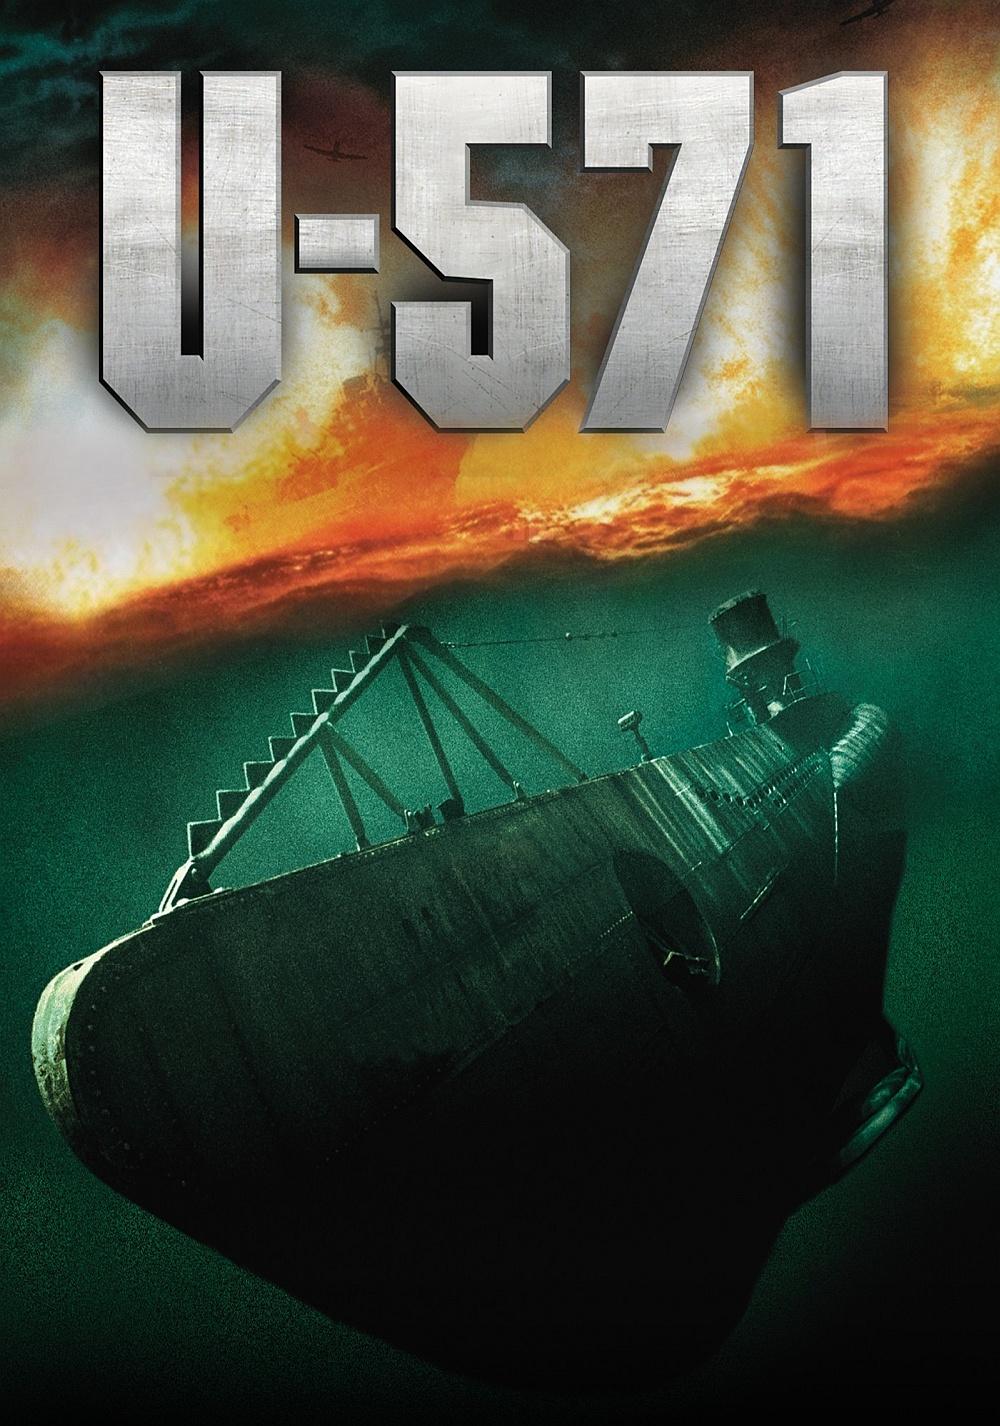 u571 movie fanart fanarttv